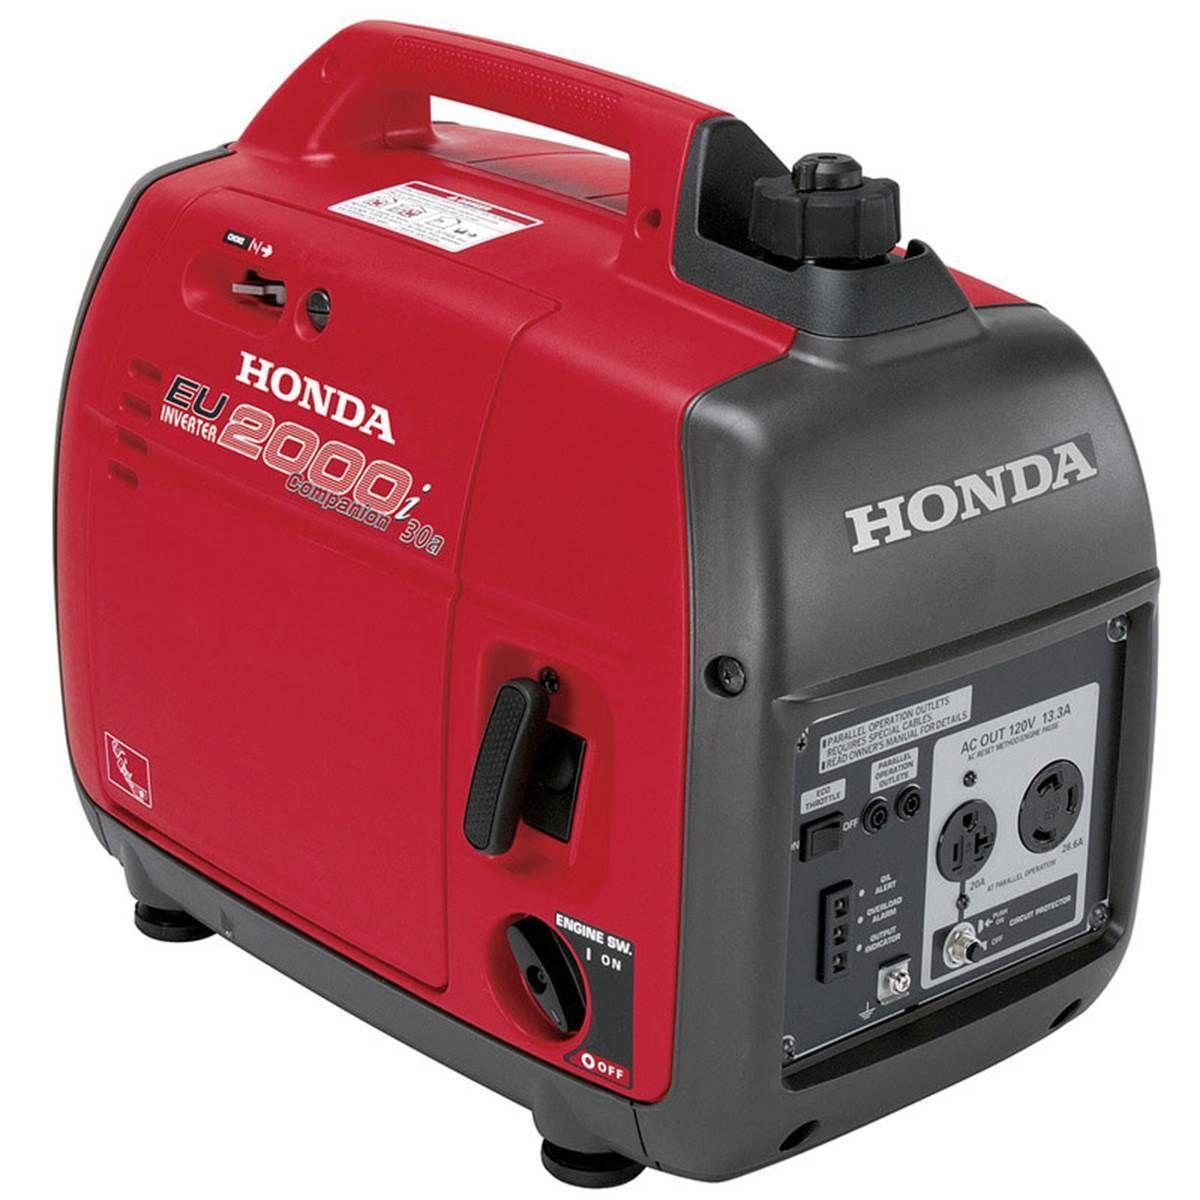 Honda EU2000 Portable Inverter Generator â 2000 Surge